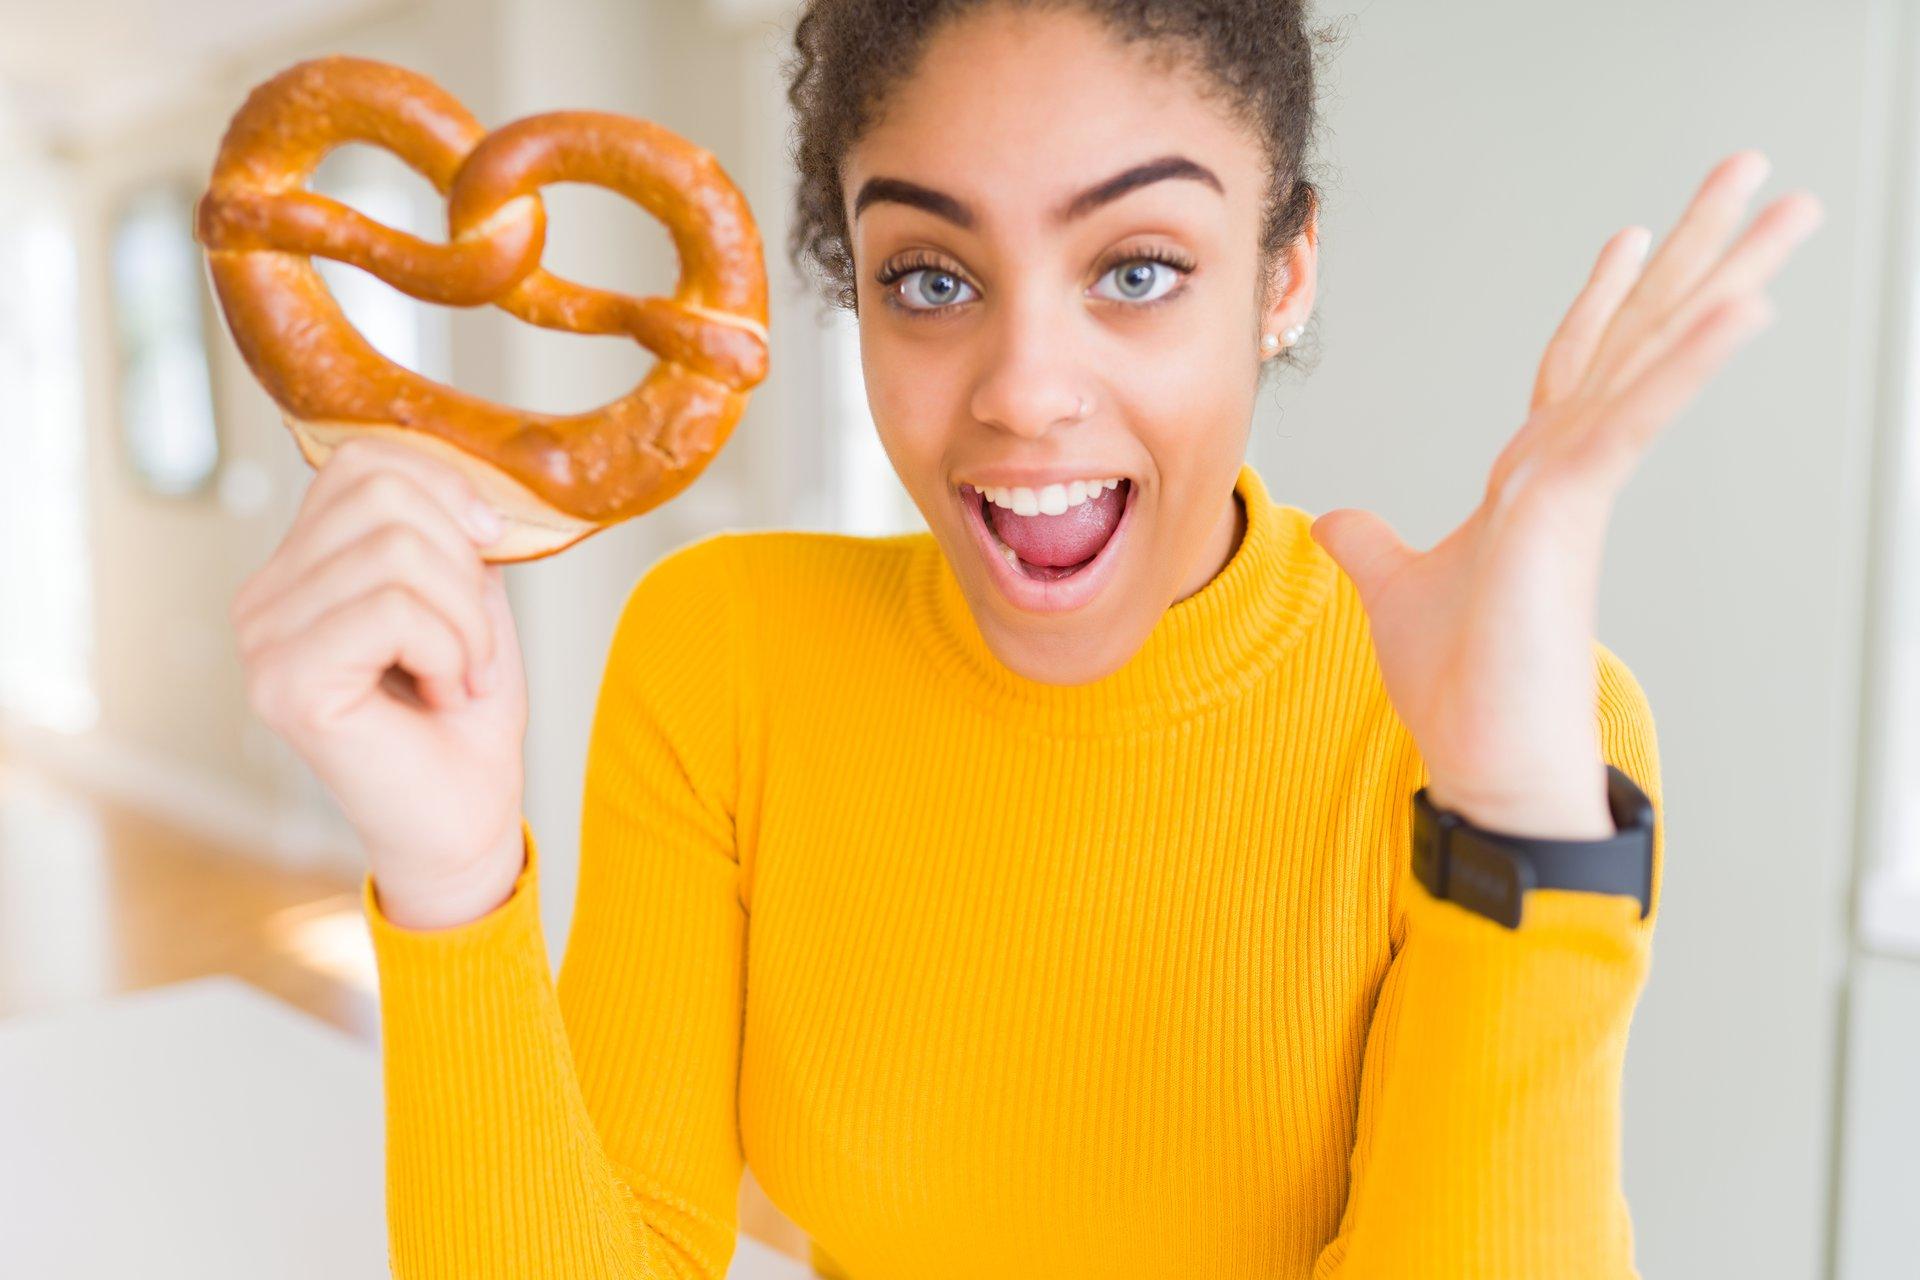 Woman with pretzel